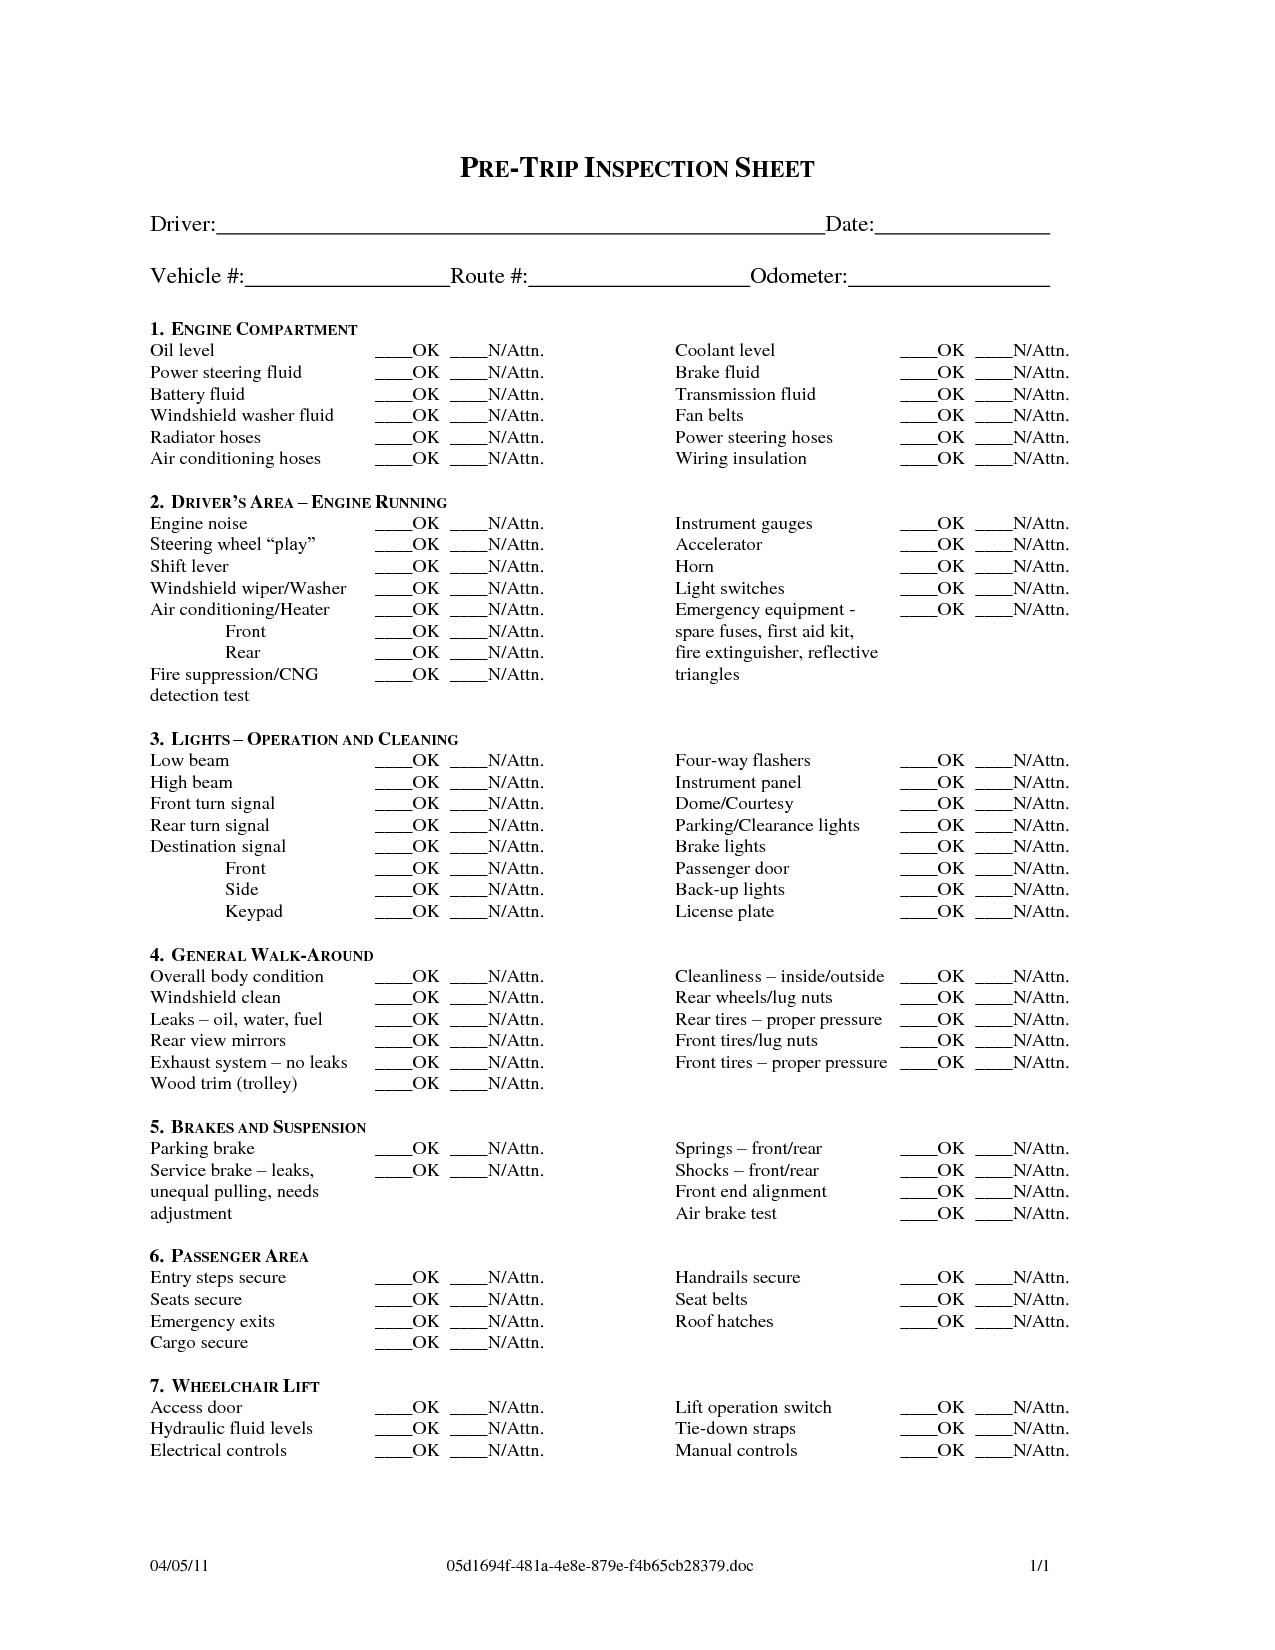 cdl pre trip inspection diagram modine pdp 150 wiring free checklist sheet